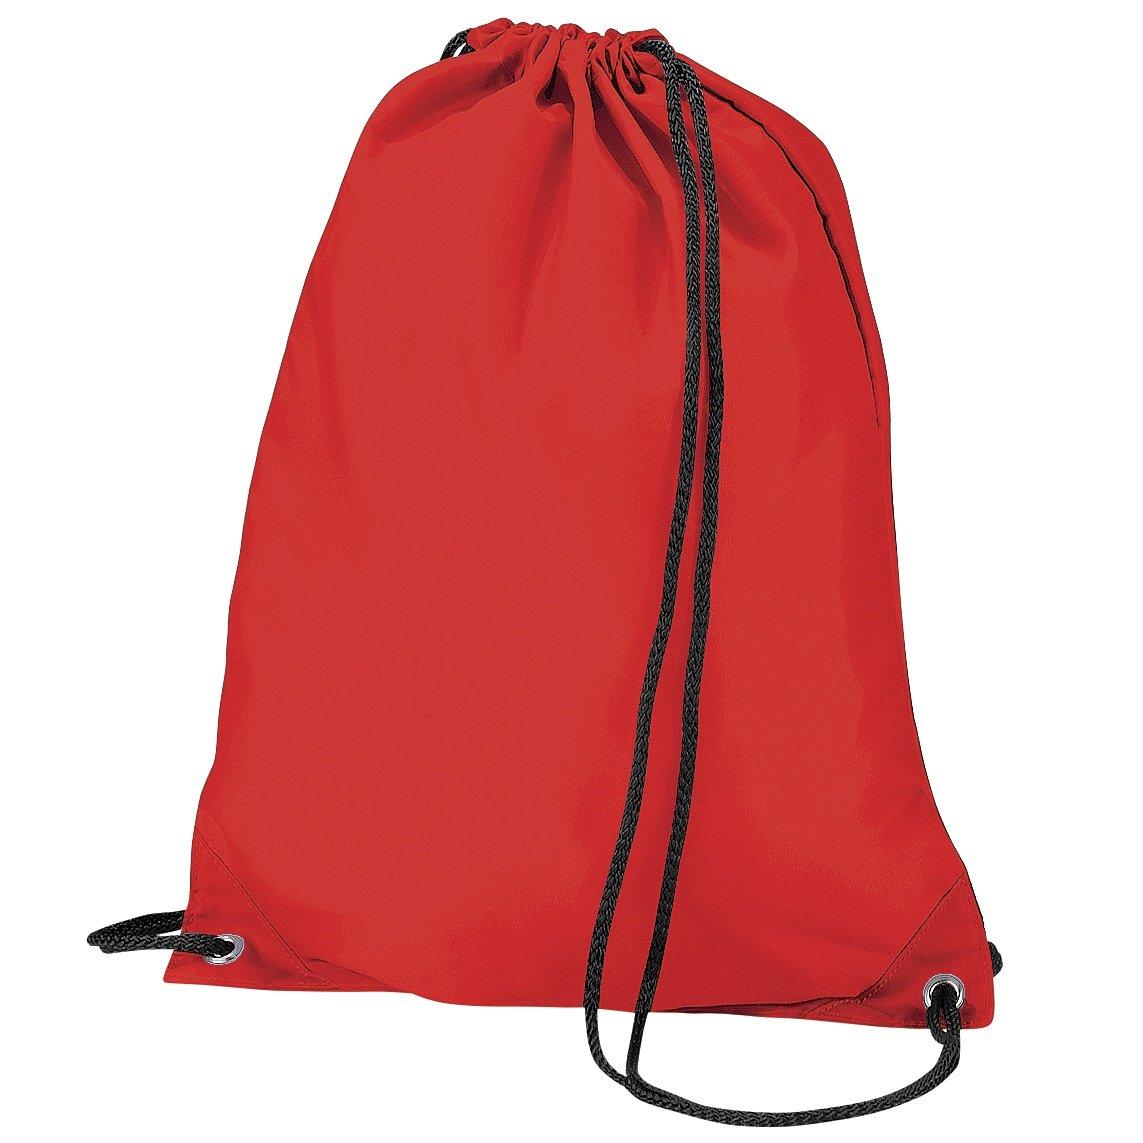 BagBase Budget Water Resistant Sports Gymsac Drawstring Bag (11L) (One Size) (Black) UTBC2538_1